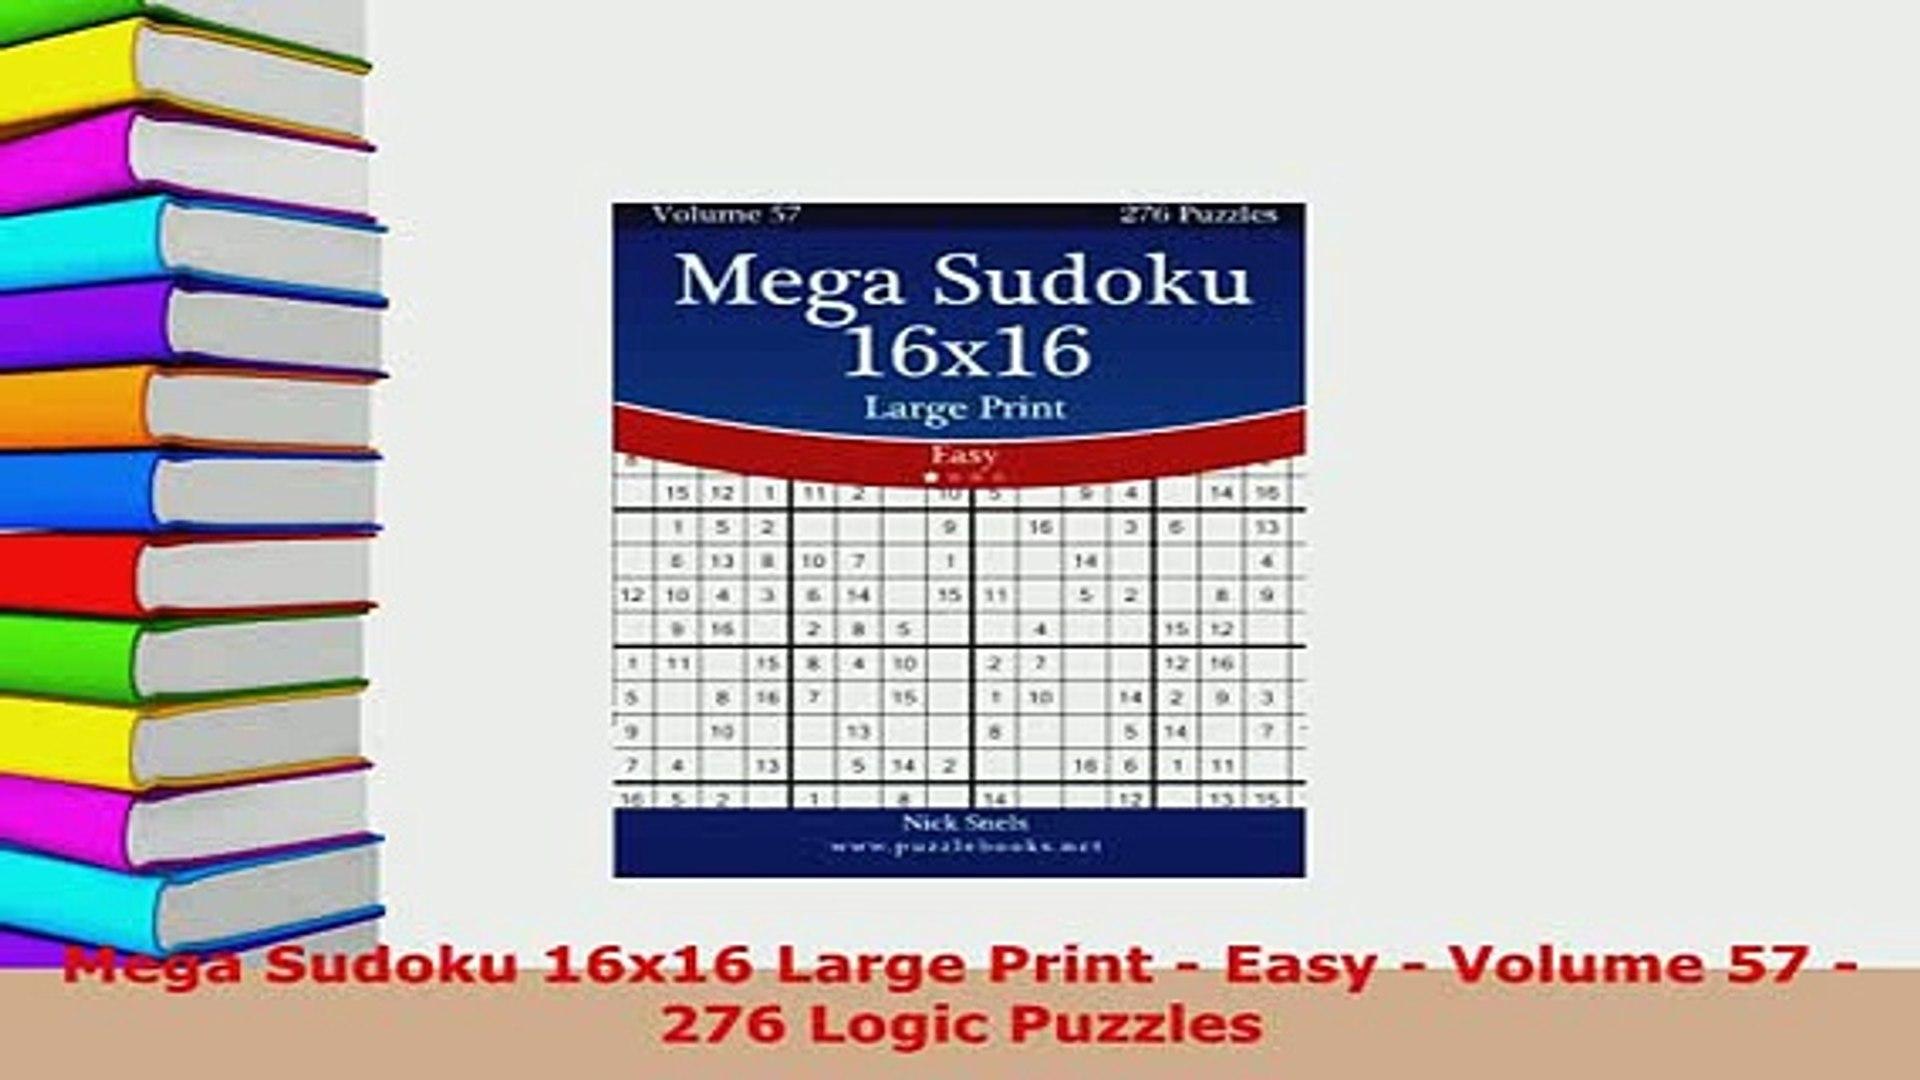 image regarding Sudoku 16x16 Printable called Down load Mega Sudoku 16x16 Major Print Very simple Total 57 276 Logic Puzzles Free of charge Textbooks